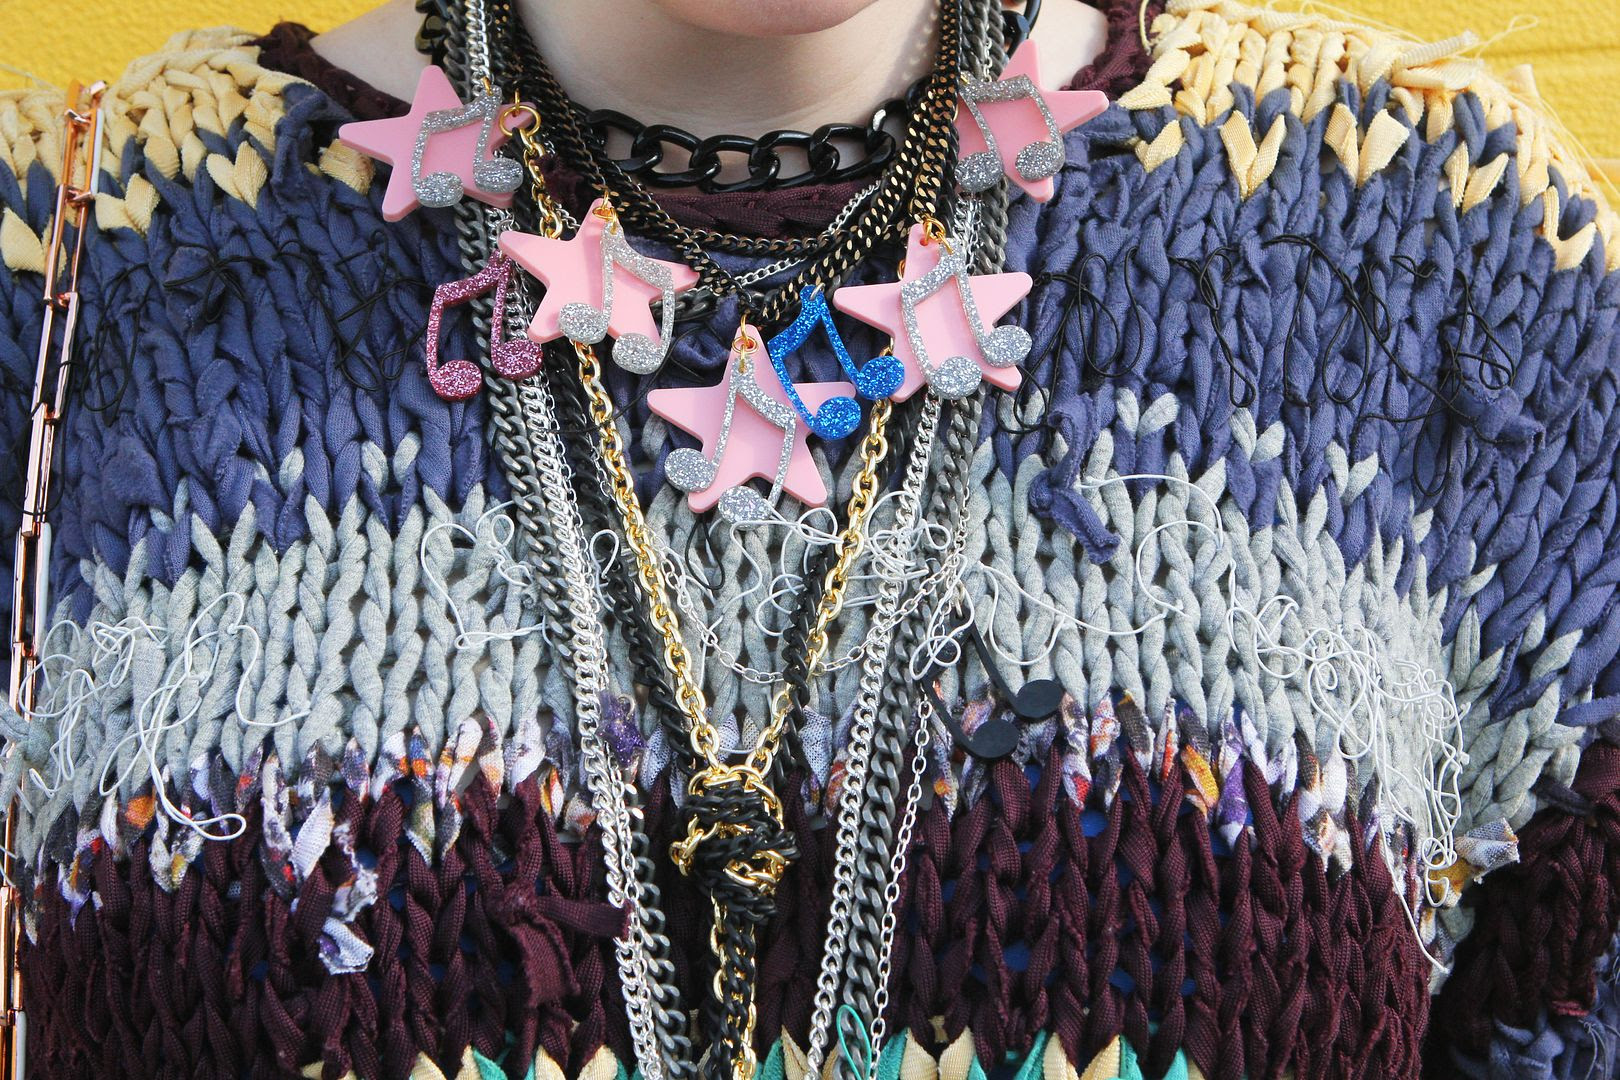 photo trixystarrnecklace-trixystarr-beckerman-jewelry-isabelmarant.jpg